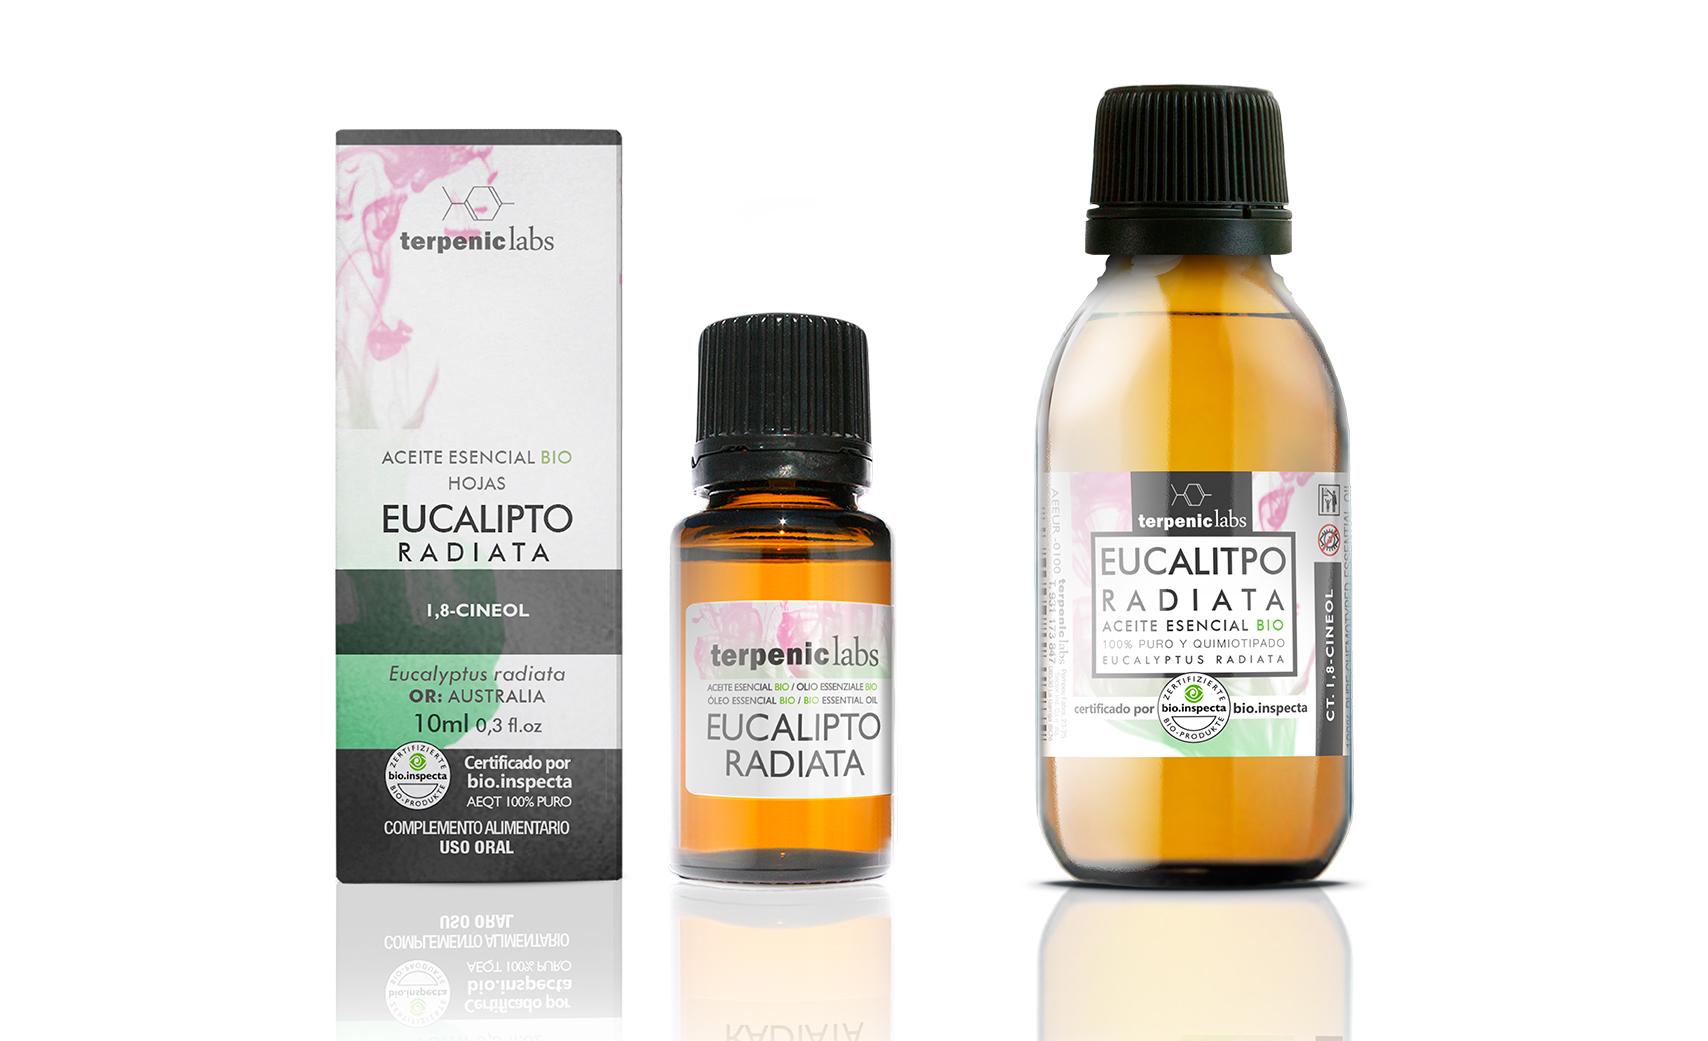 Eucalipto Radiata - Terpenic Labs